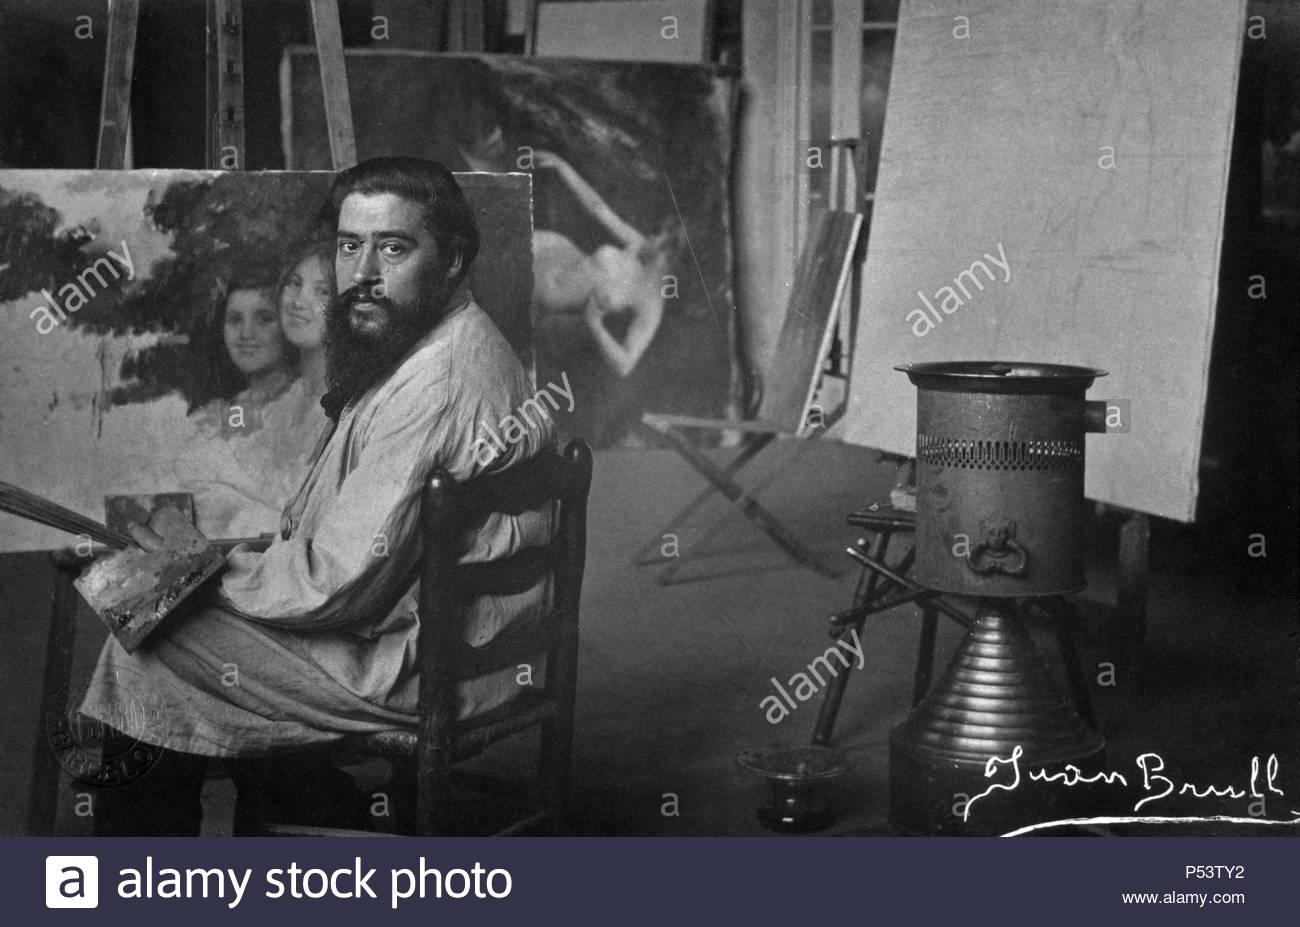 Joan Brull i Vinyoles, pintor catalán de finales del siglo XIX, representante del simbolismo catalán. - Stock Image